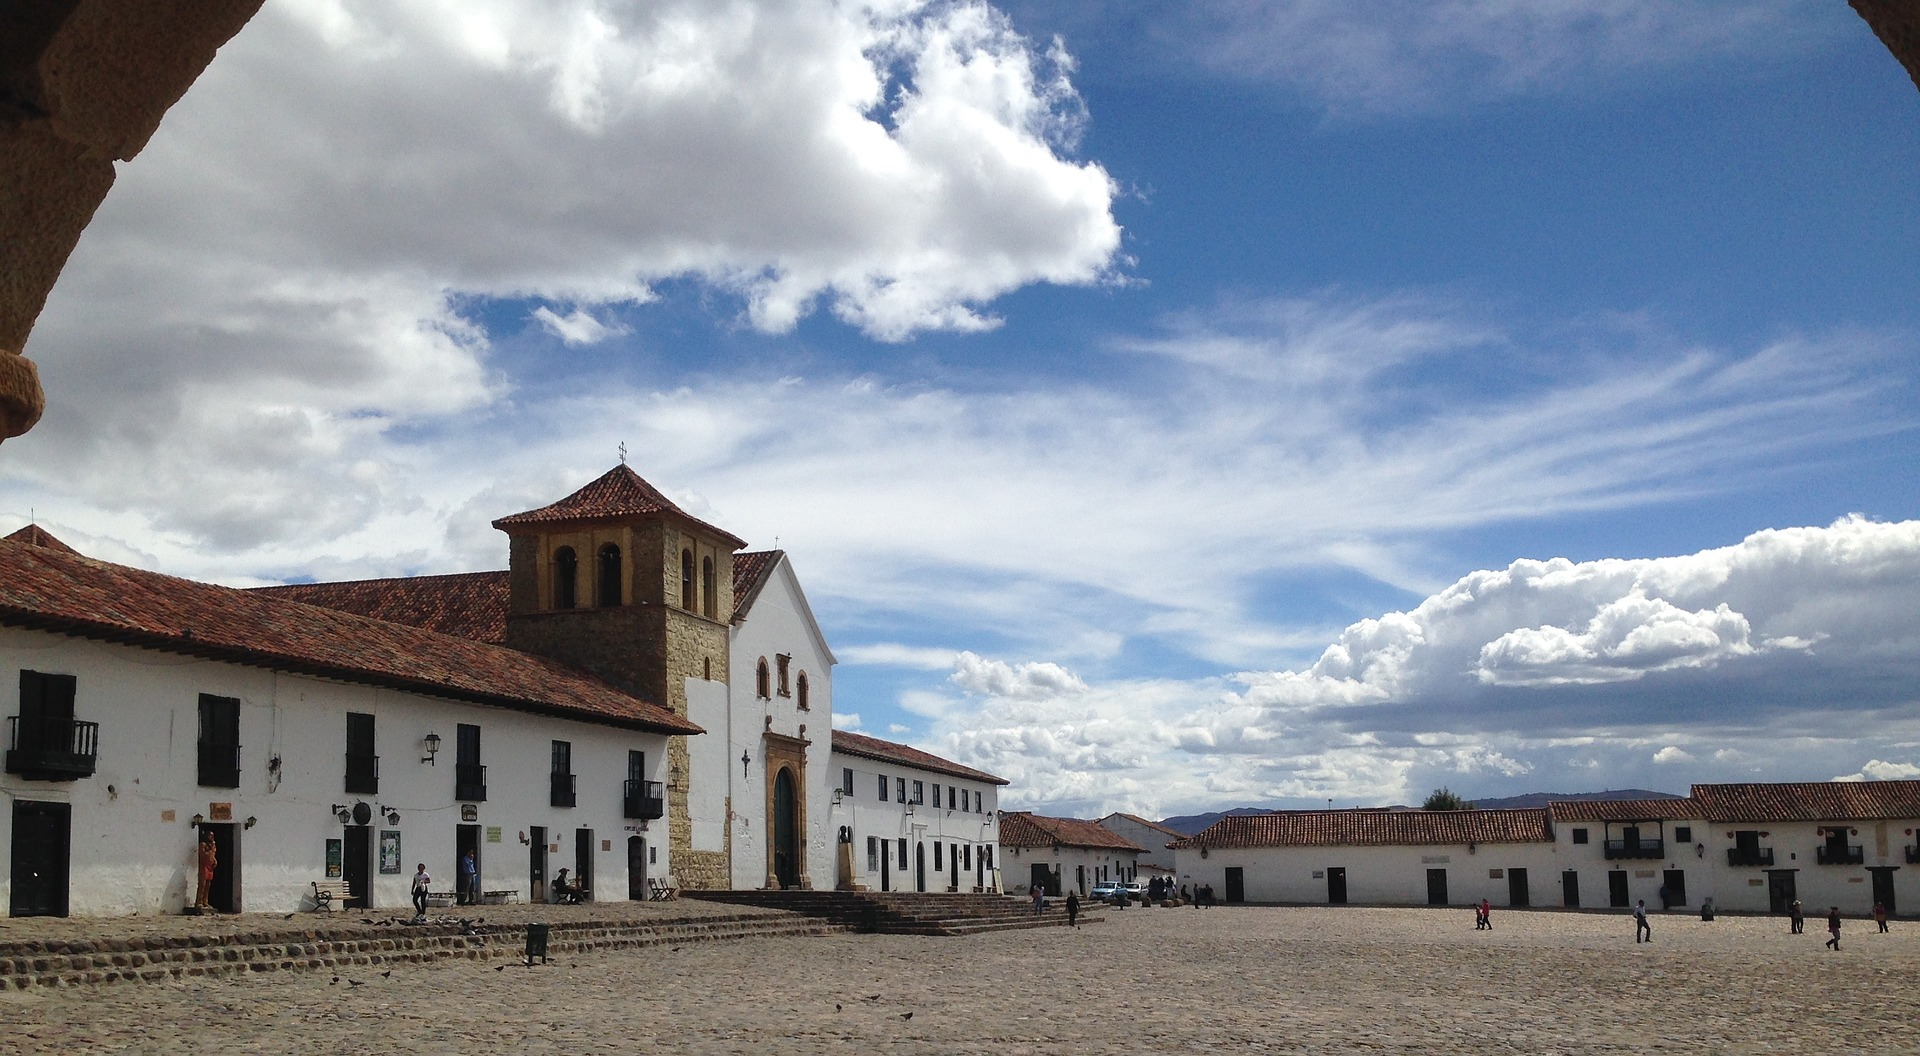 villa-de-leyva-954629_1920